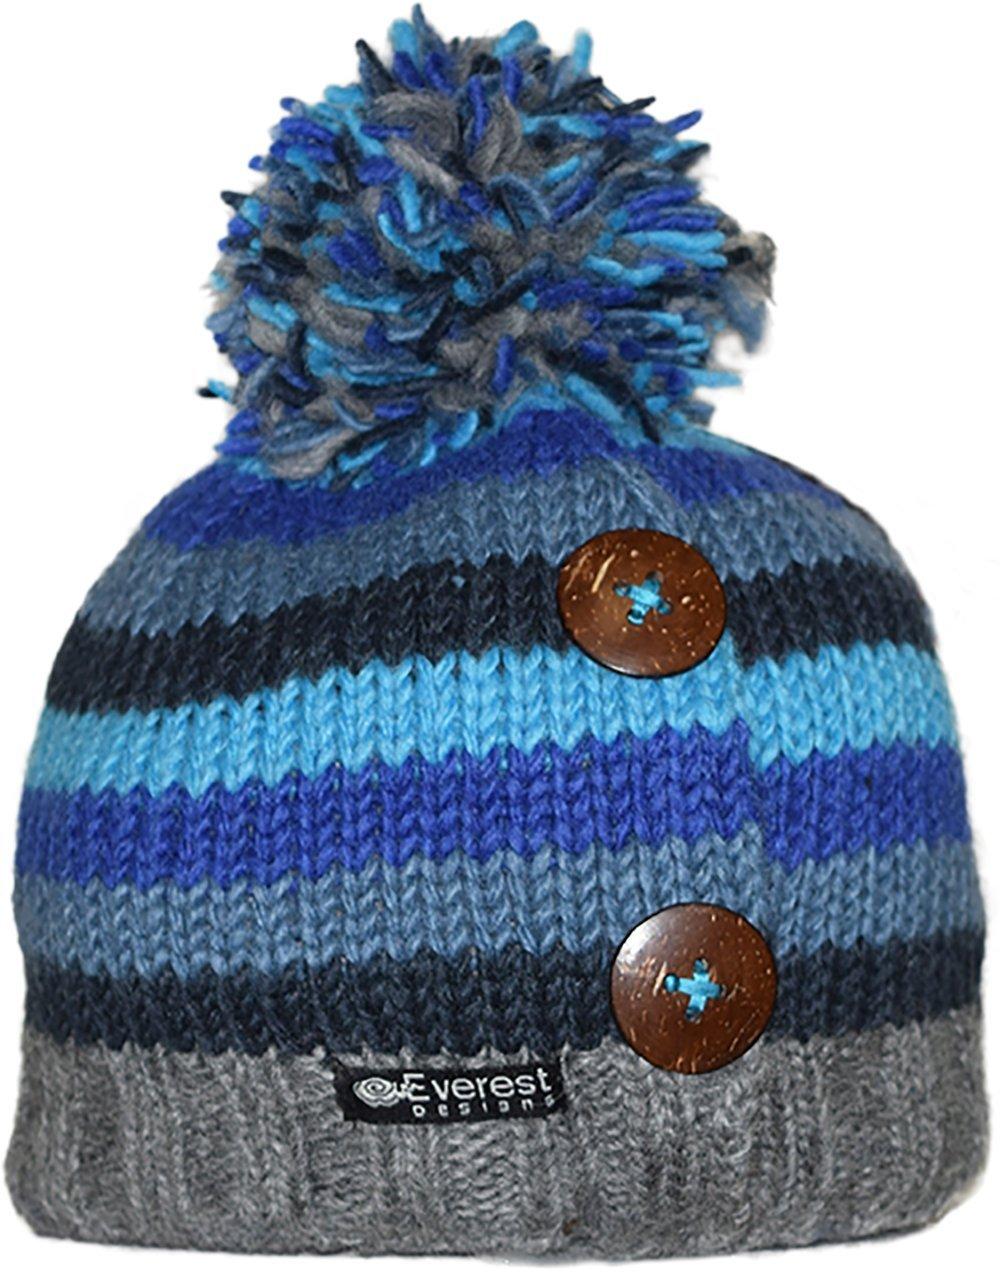 Everest Designs Caras Beanie-k Hat, Blue, One Size everest-designs B161301-K